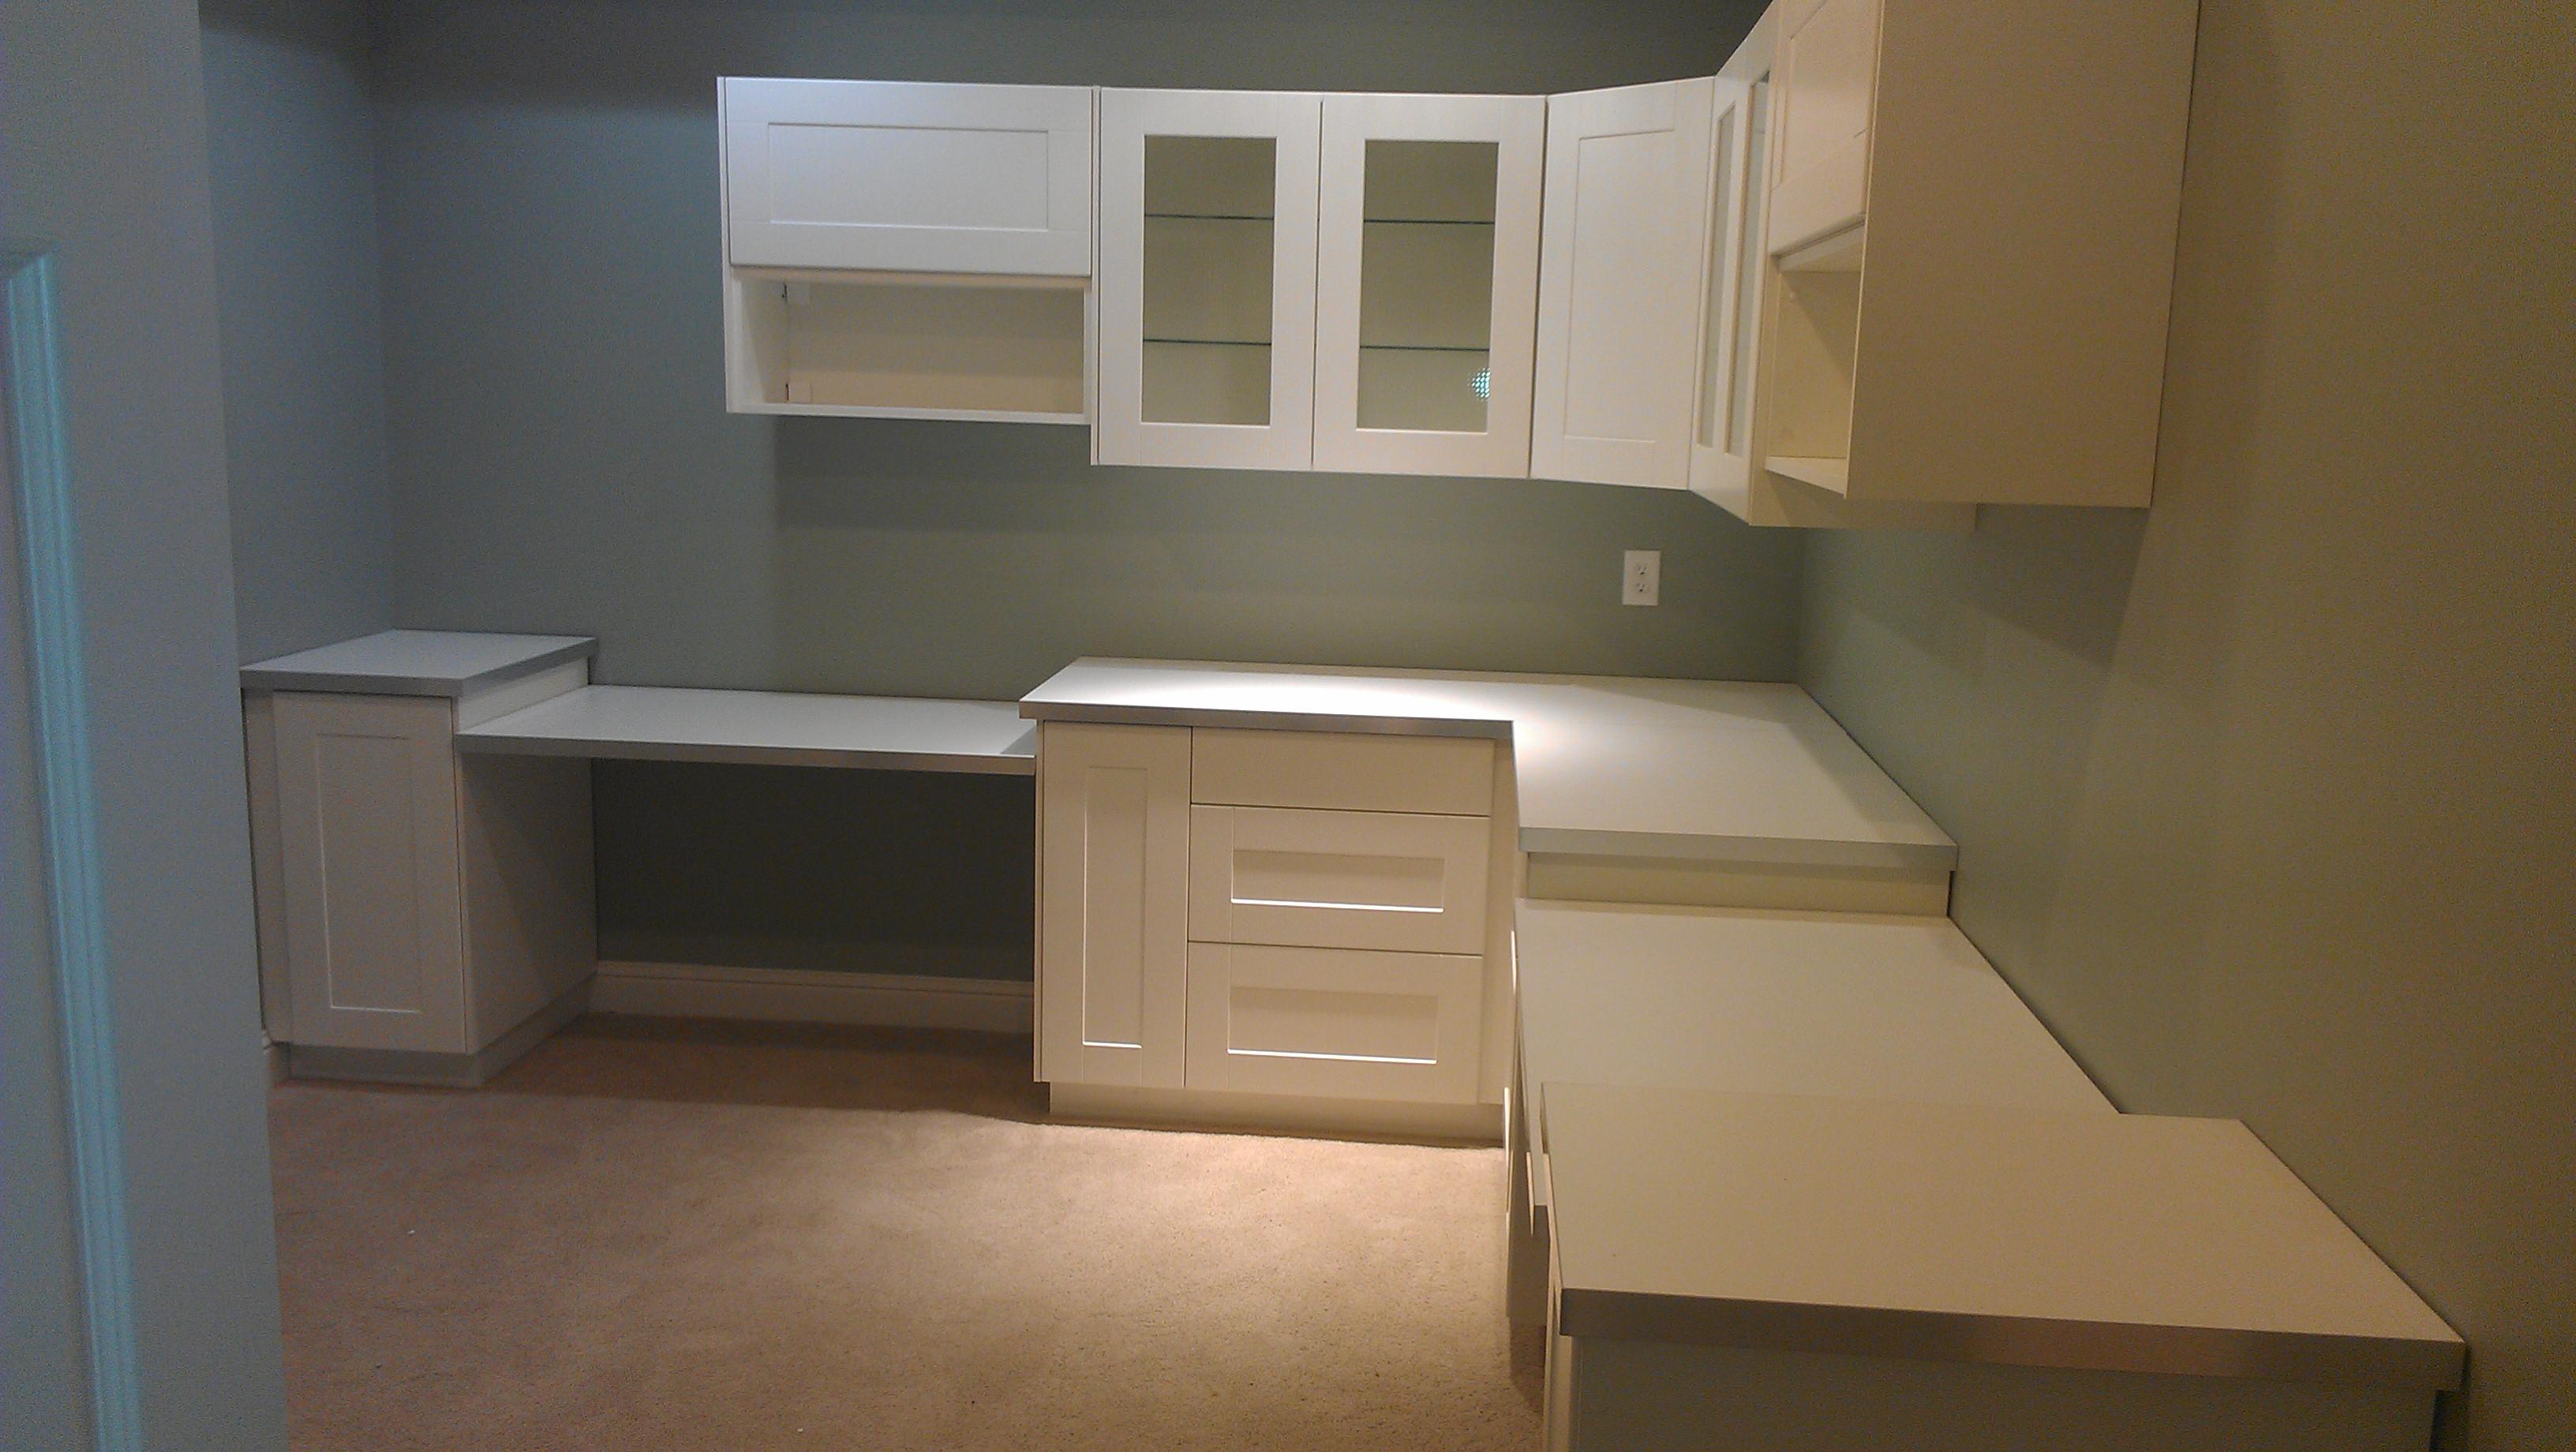 mccrossin industries inc ikea kitchen installation atlanta ga ikea kitchen del. Black Bedroom Furniture Sets. Home Design Ideas